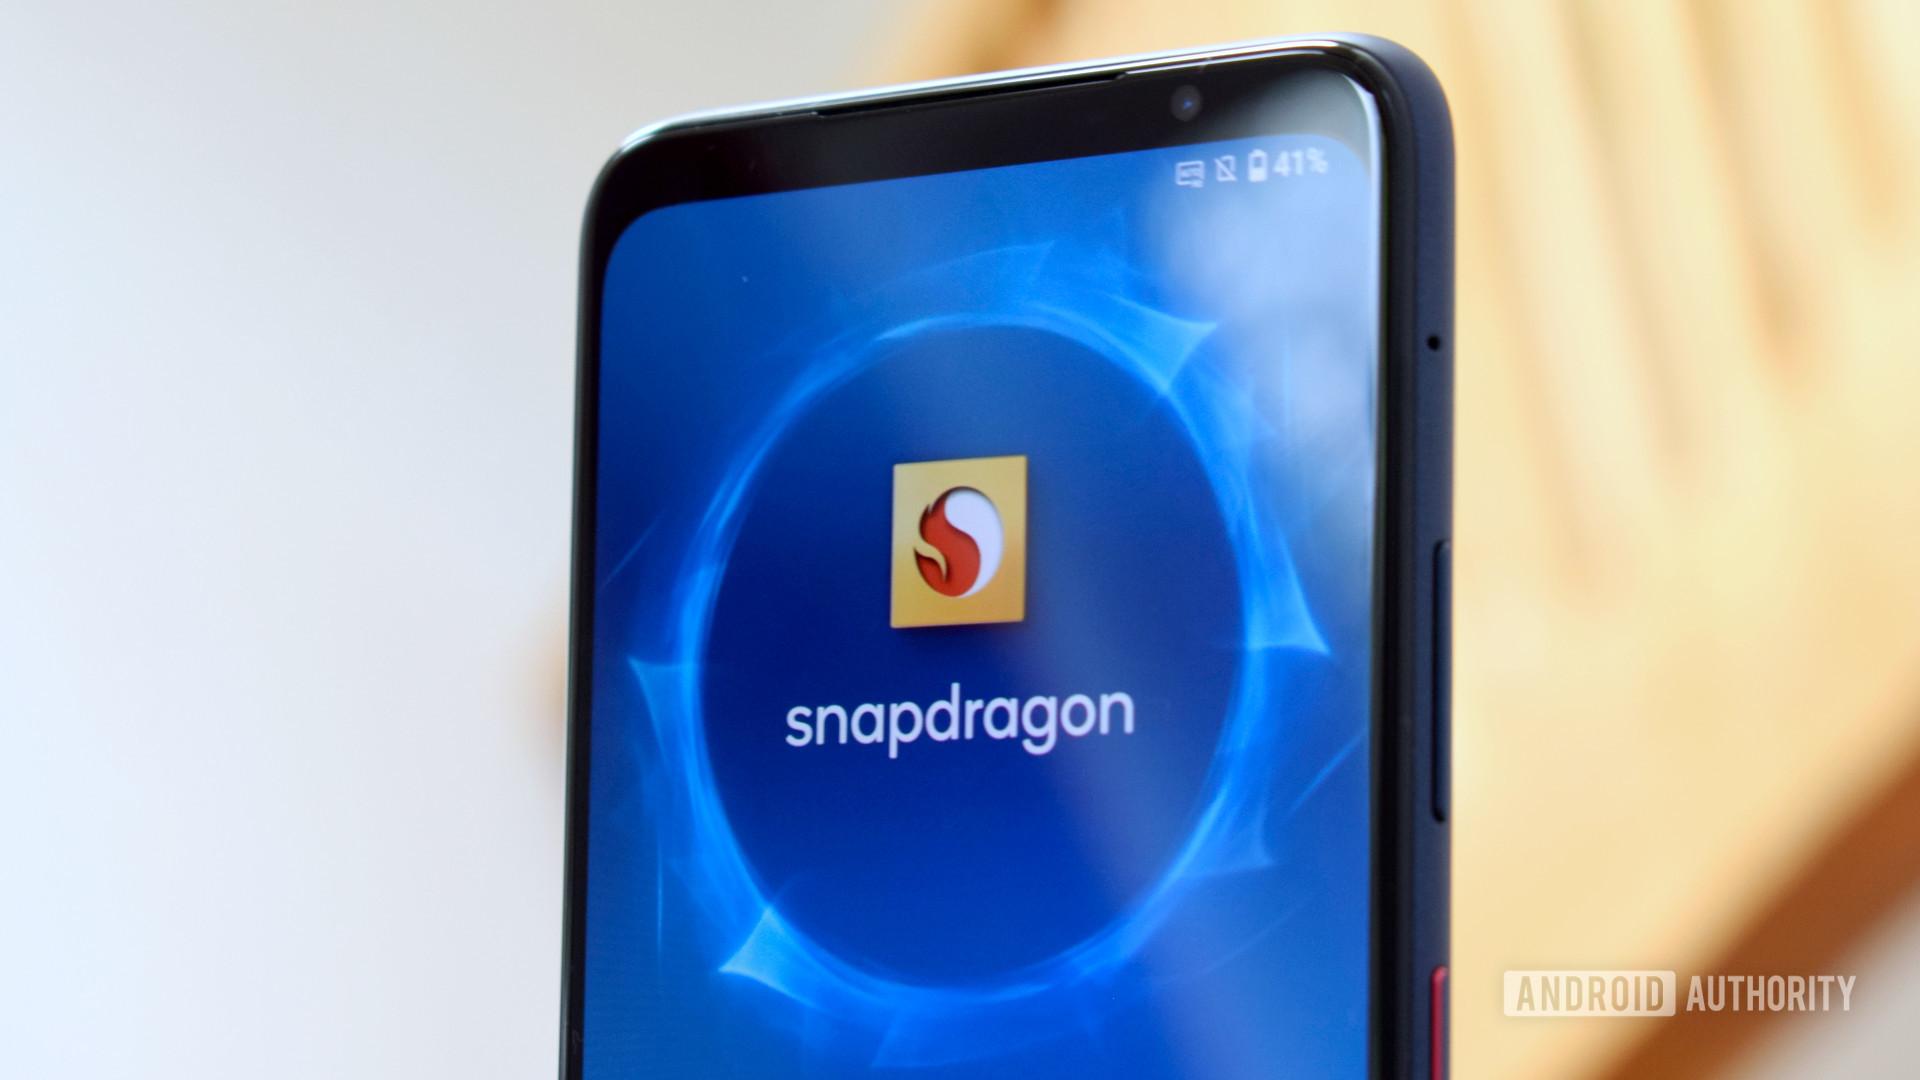 Qualcomm Smartphone logo on display